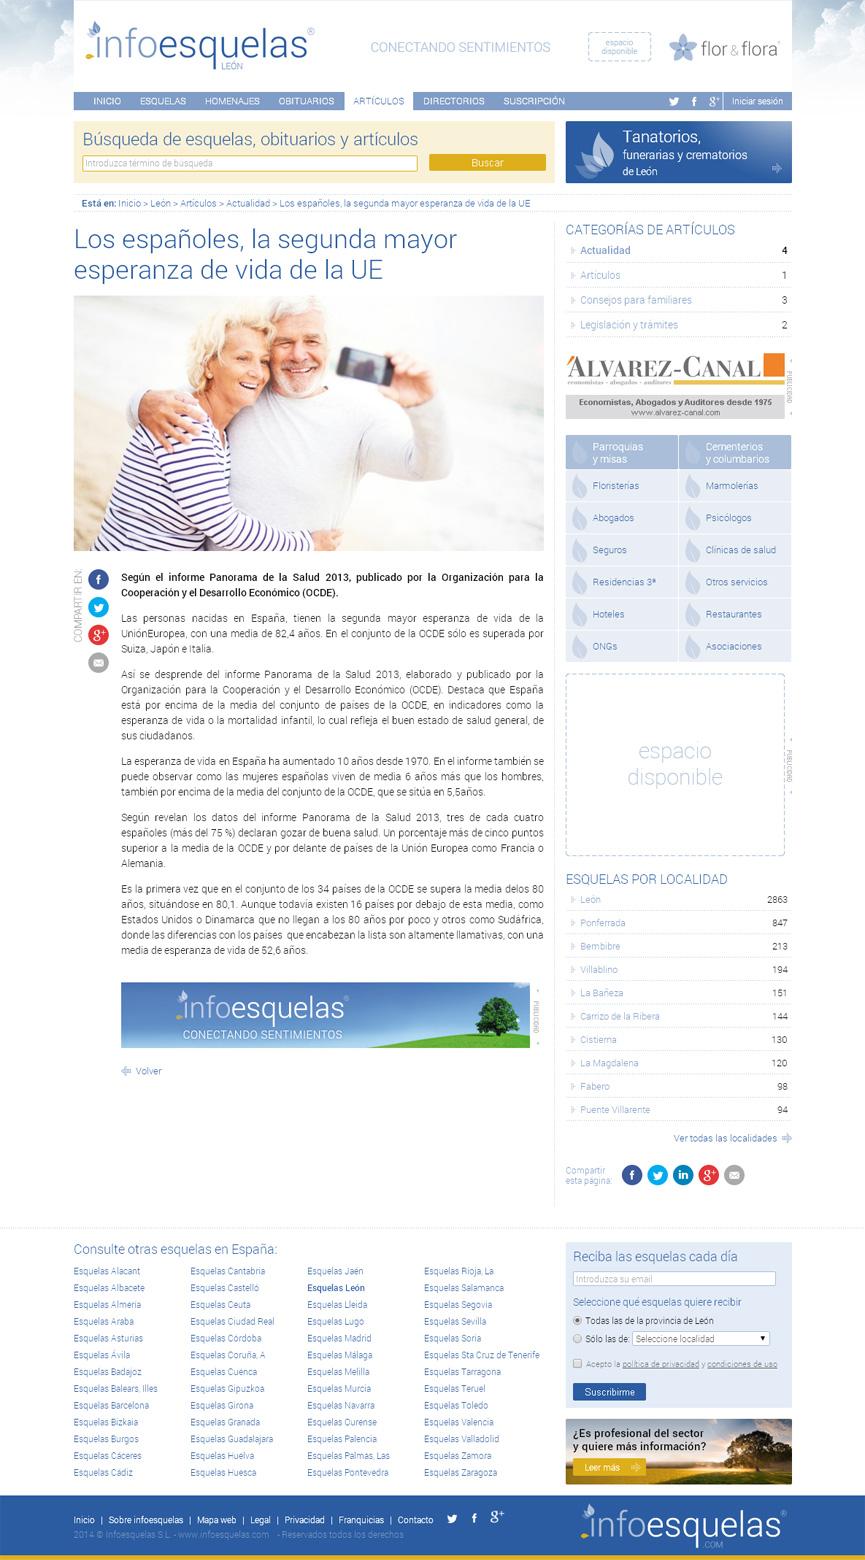 Infoesquelas_info5